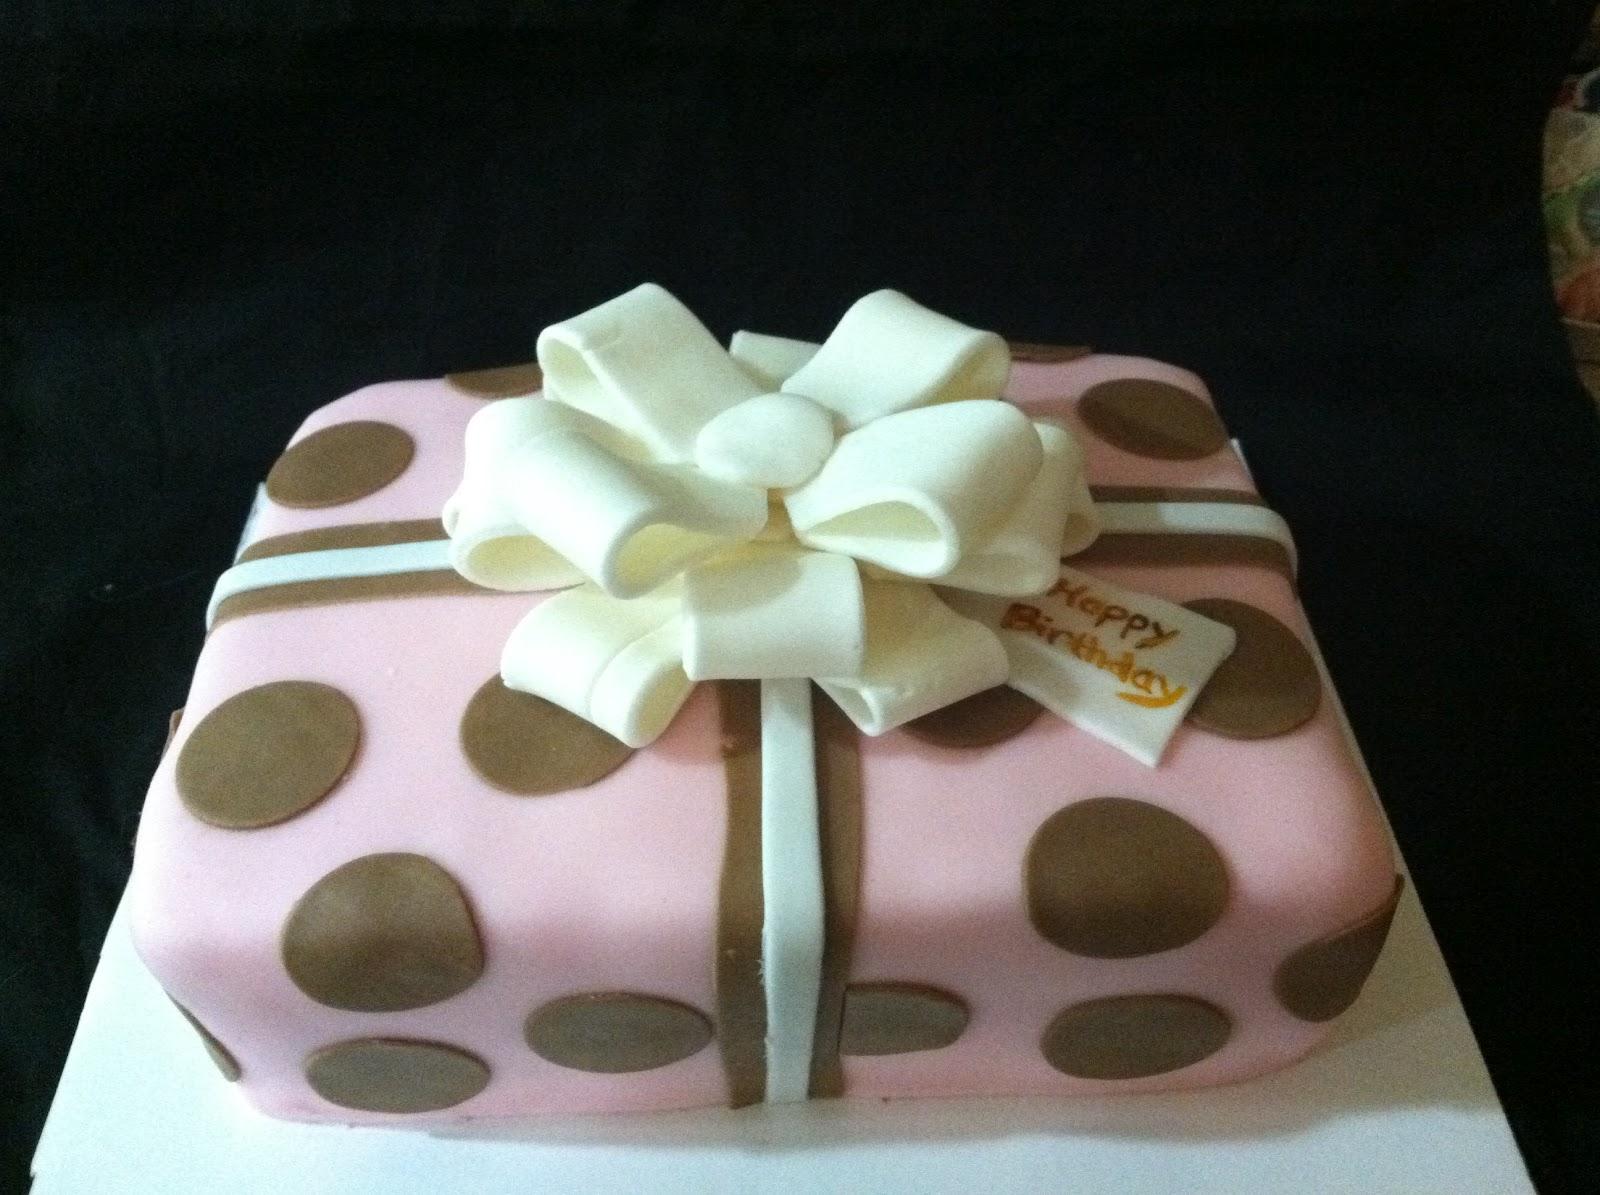 Cake Decorating for Dummies: Gift Box Cake